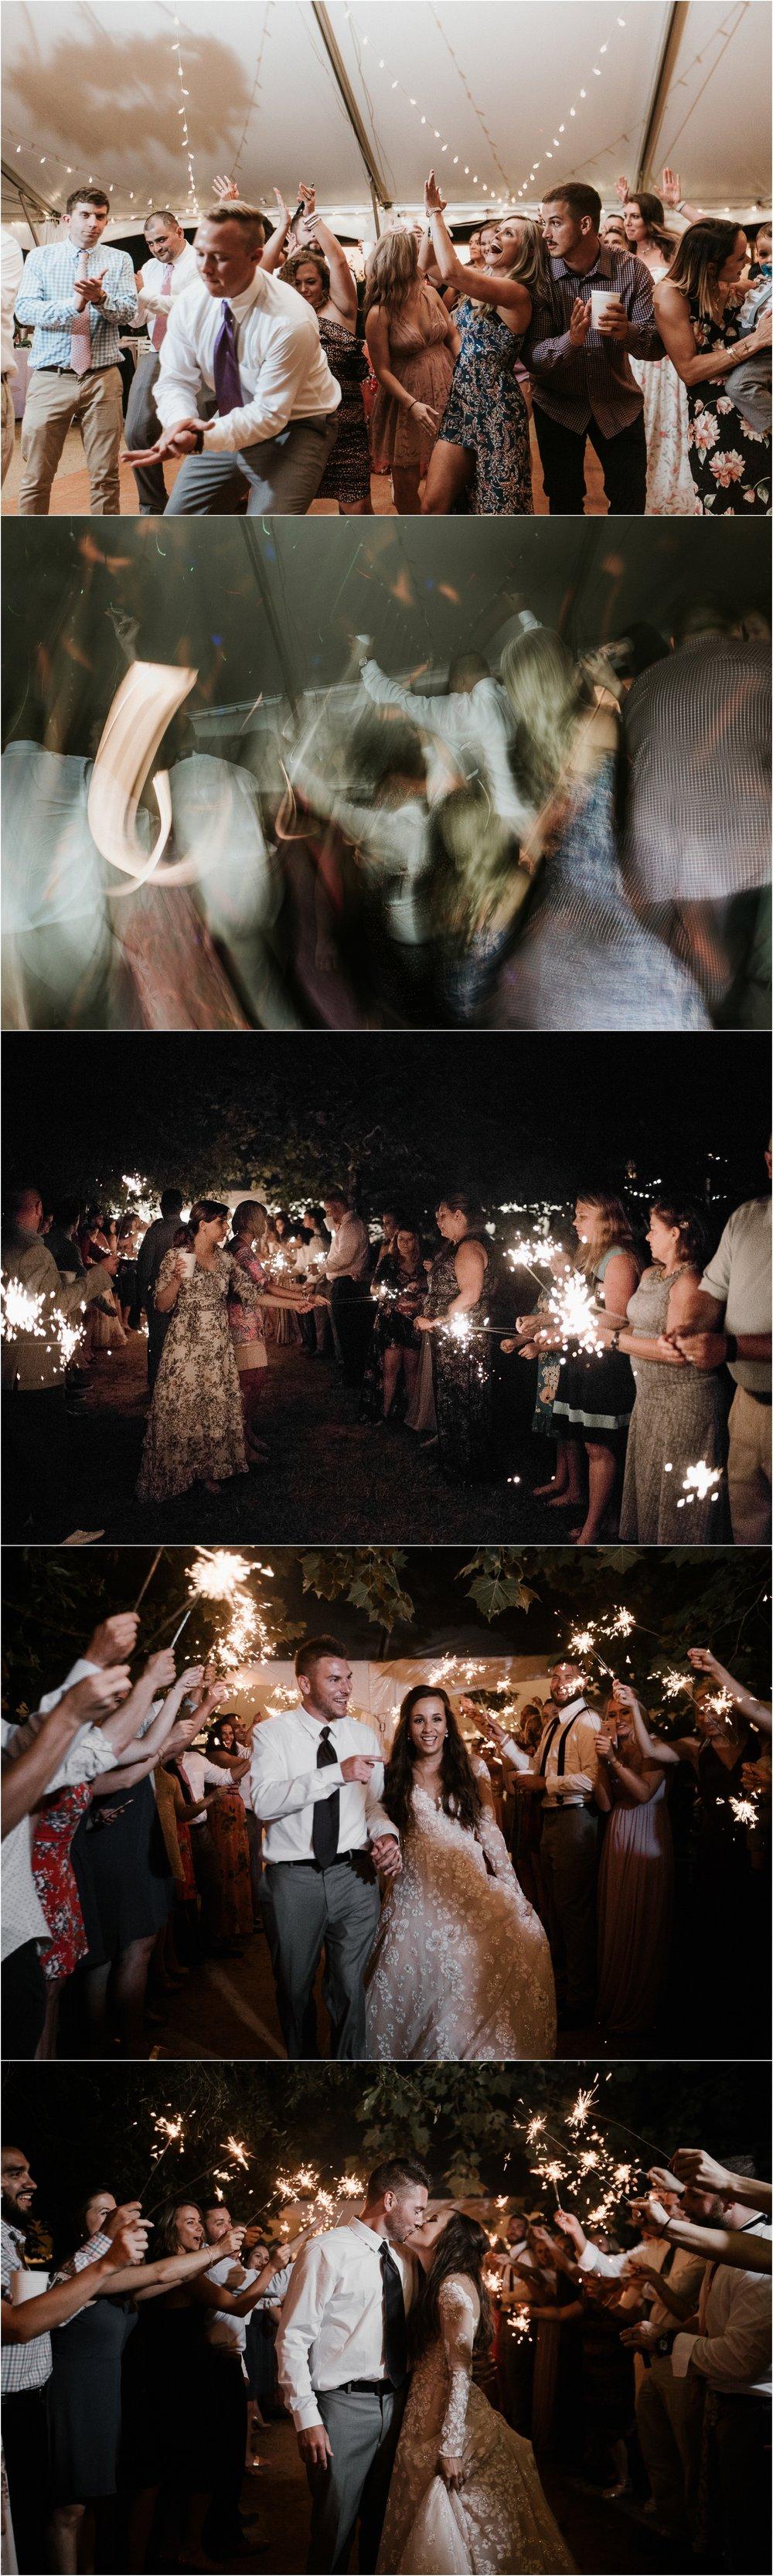 Merry-Hill-Wedding-Mebane-162.jpg